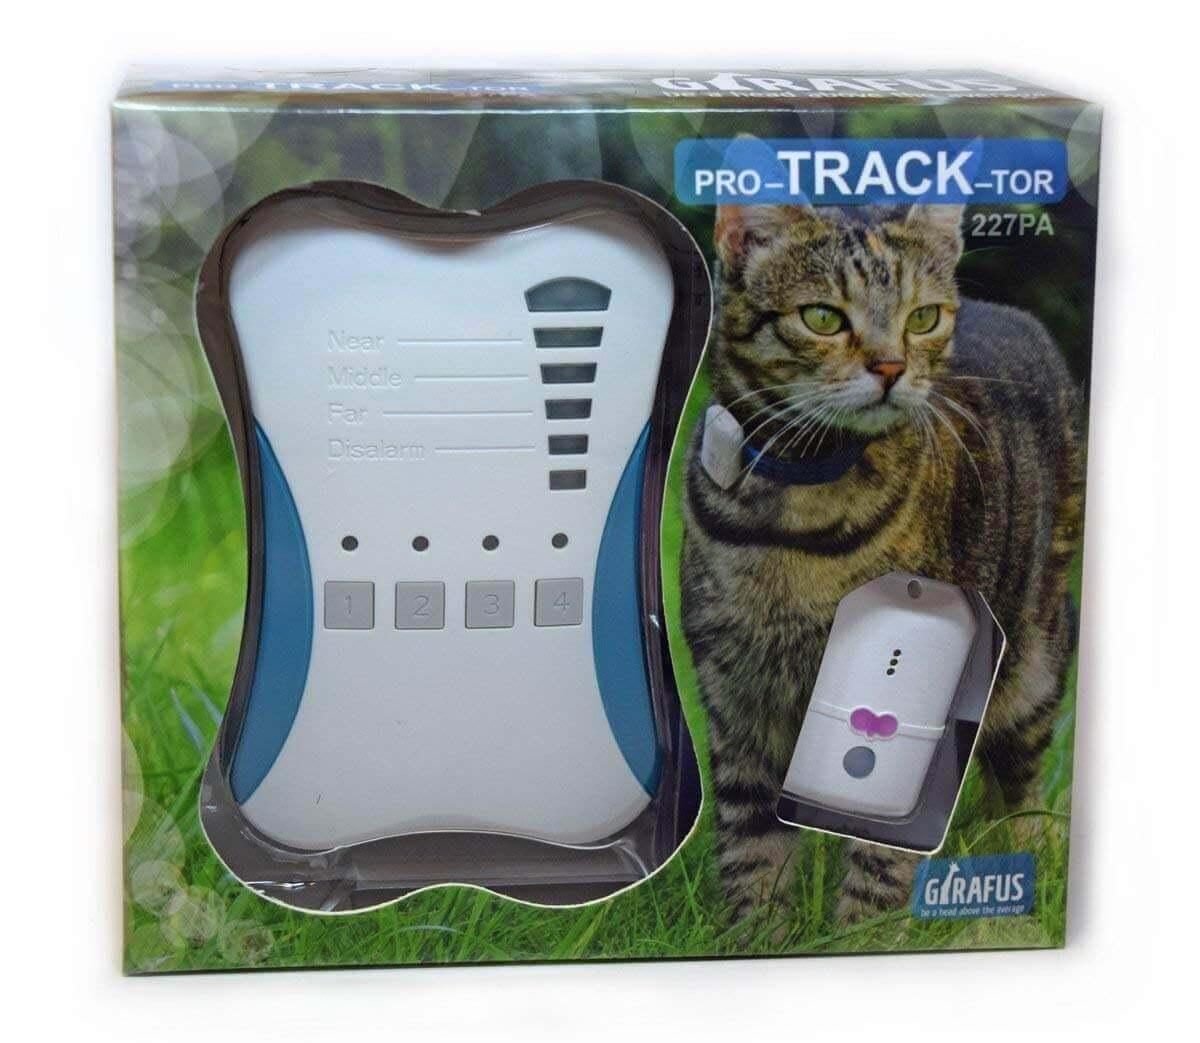 Girafus Pro-Track-Tor Pet Safety Tracker RF Technology Device